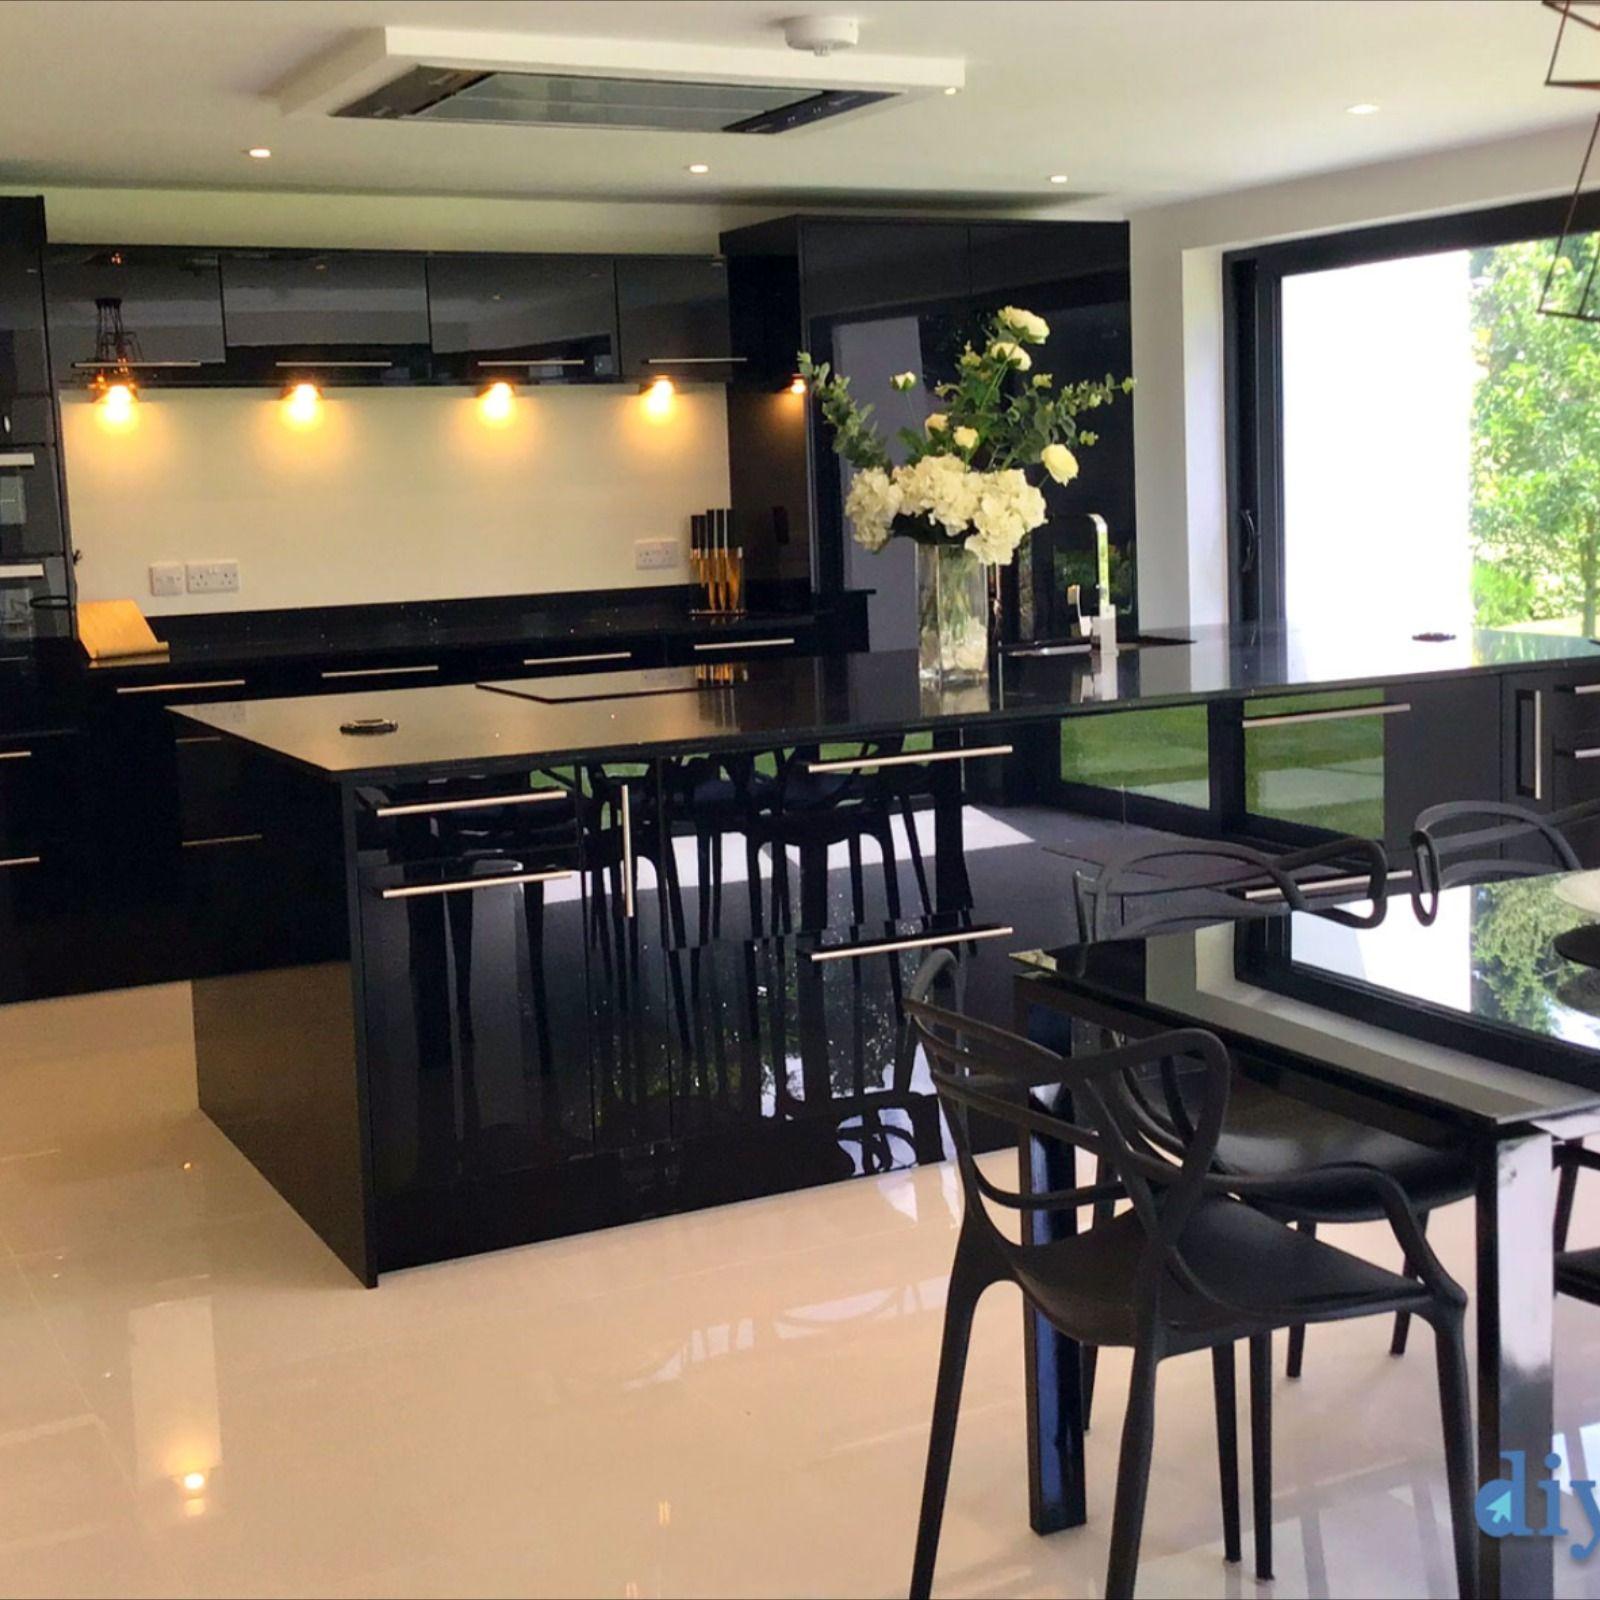 Altino Black in 2020 Cheap kitchen units, High gloss